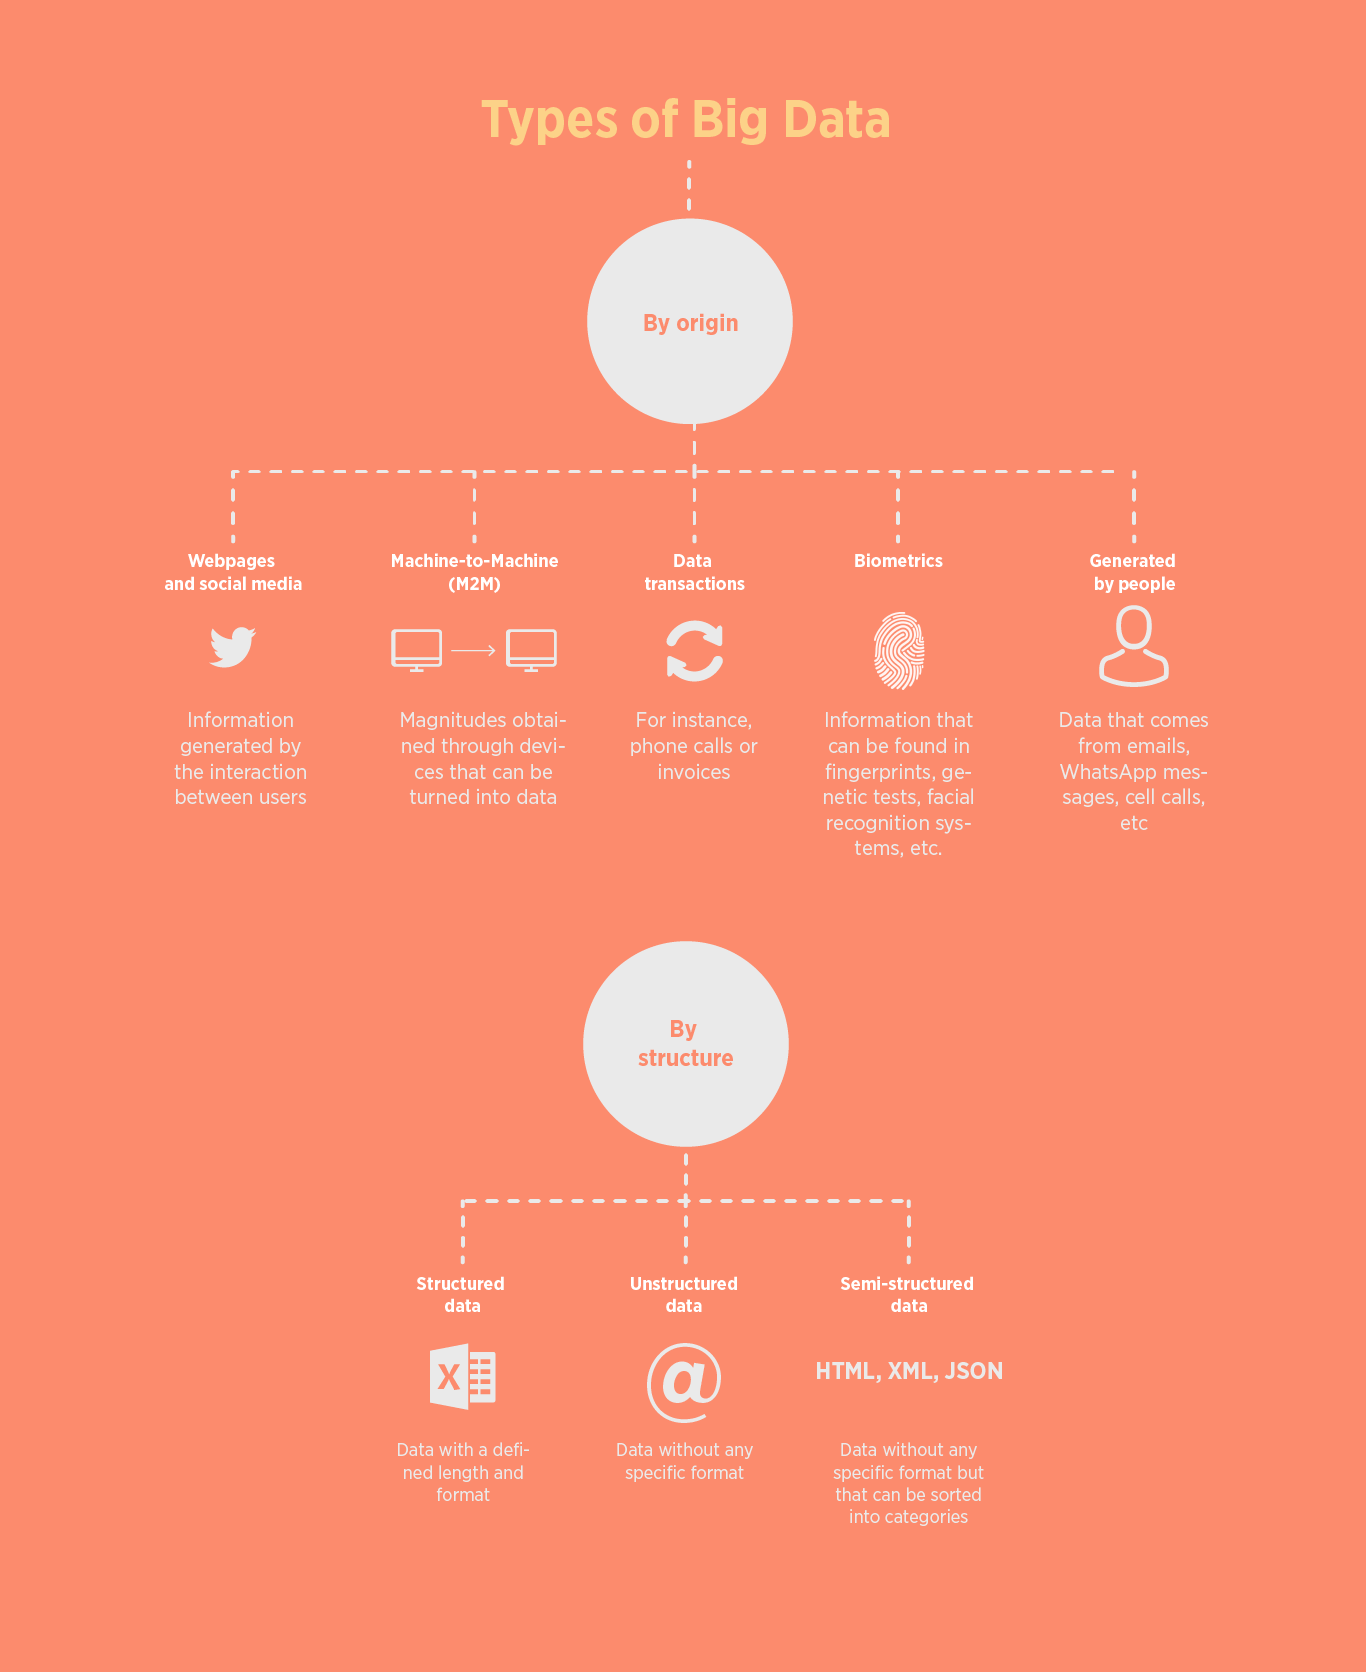 Big Data types